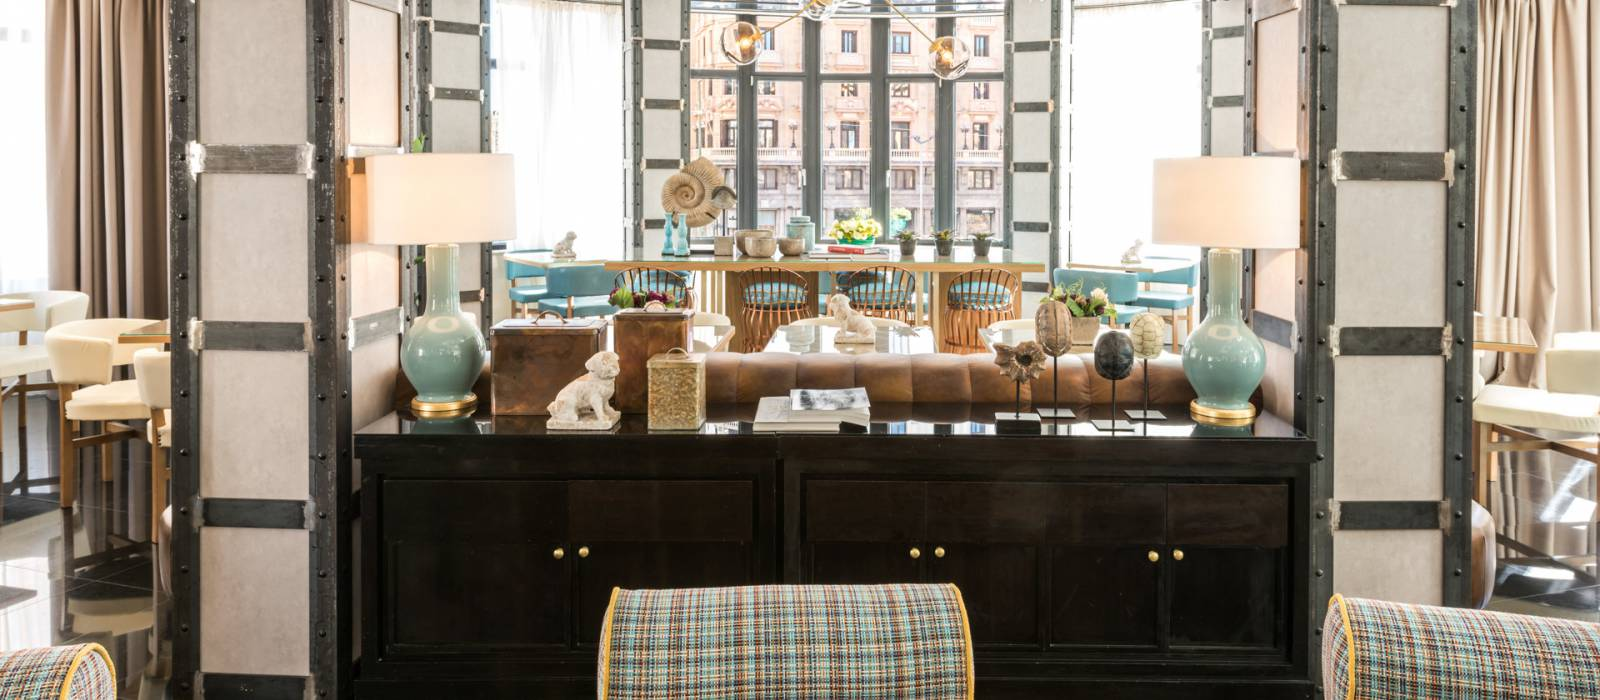 Dienstleistungen Capitol Hotel Madrid - Vincci Hoteles - Capitol Food&Bar